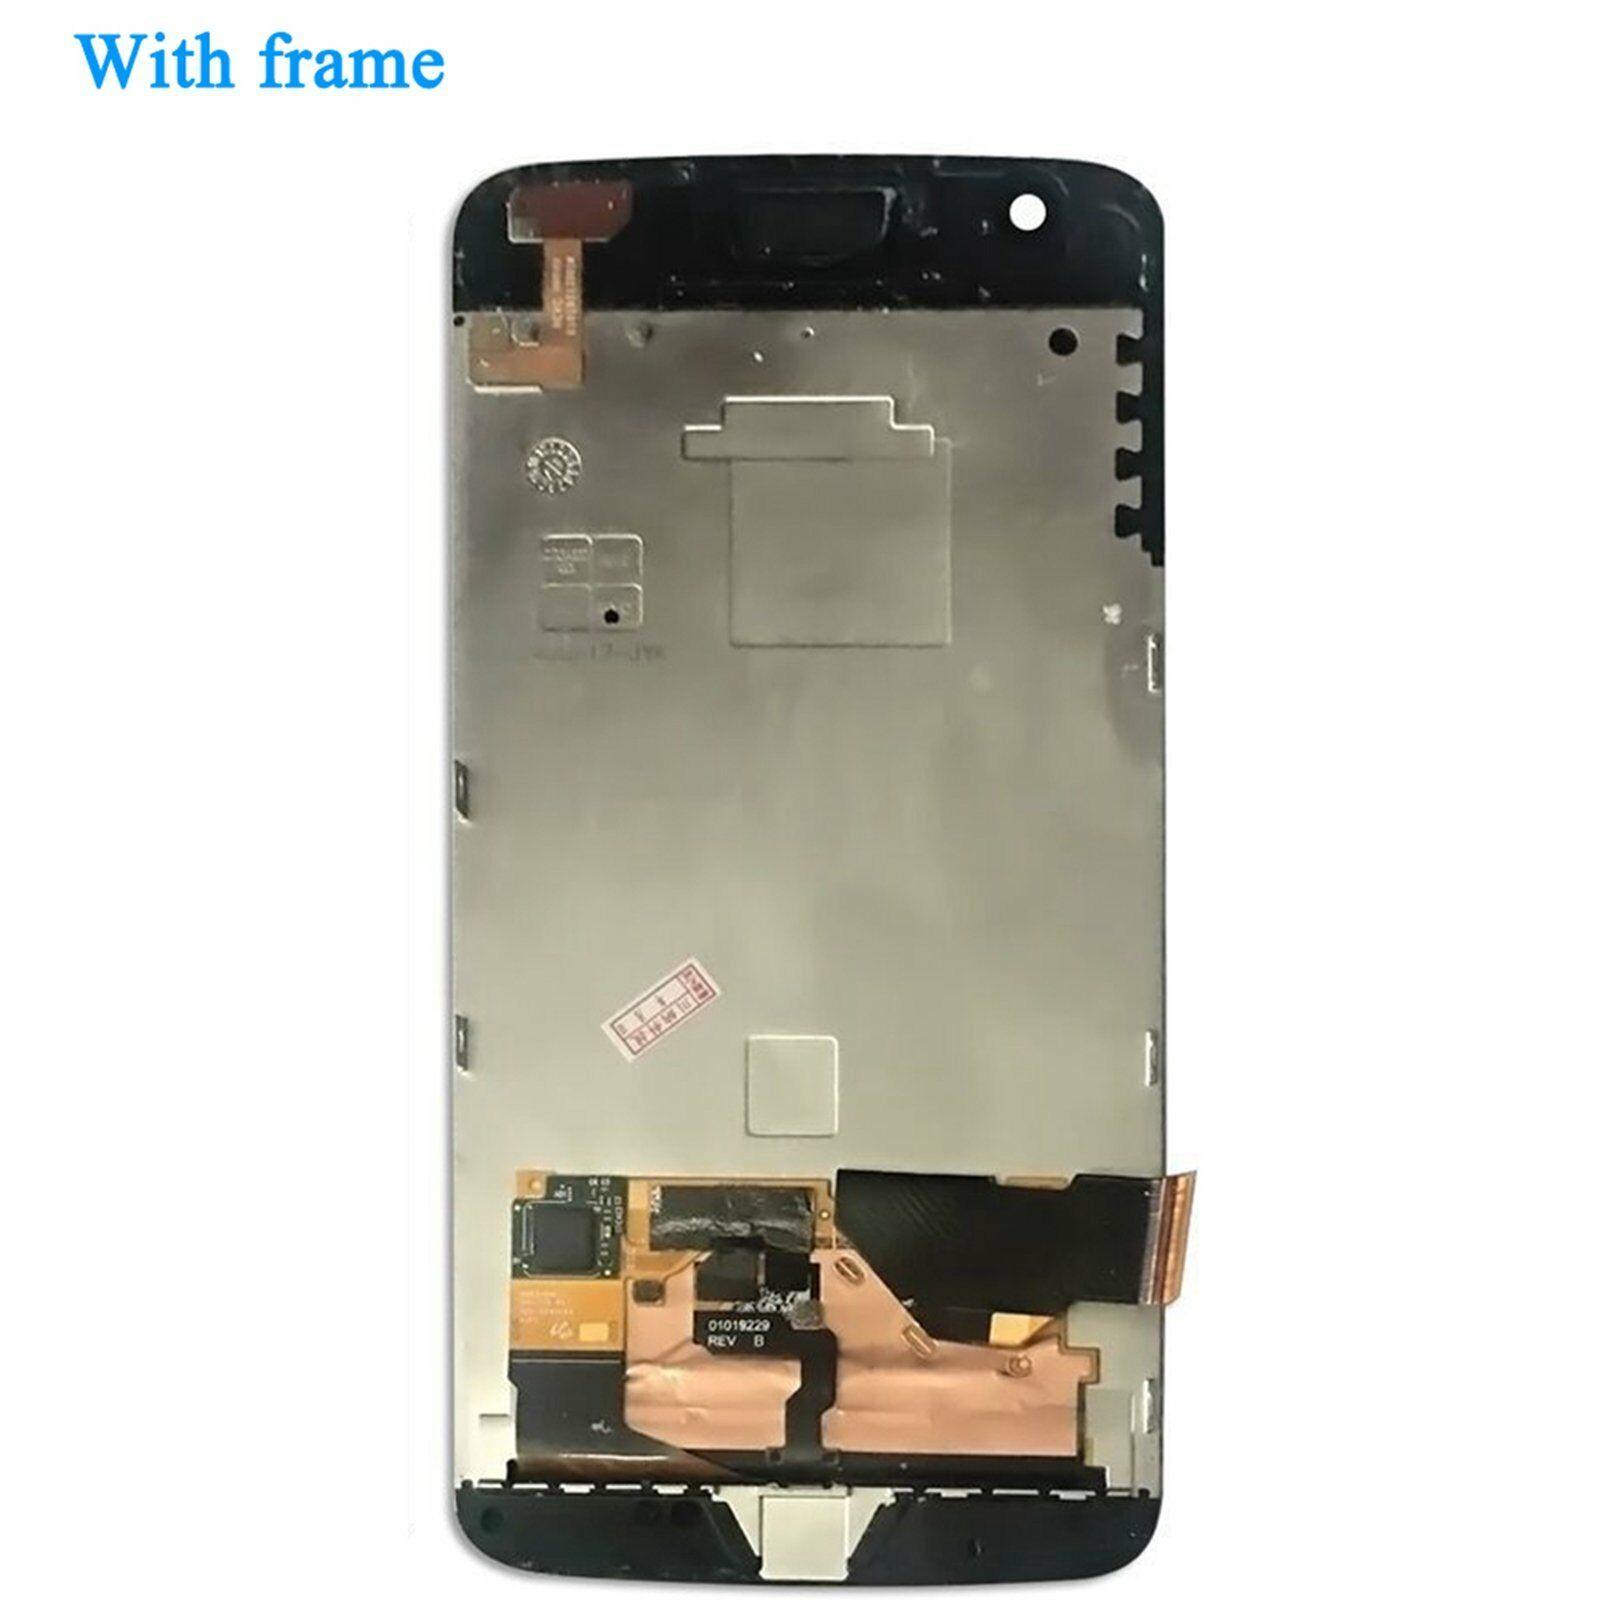 صفحه-نمایش-گوشی-موبایل-lcd-touch-screen-Motorola-Moto-Z2-Force(3).jpg